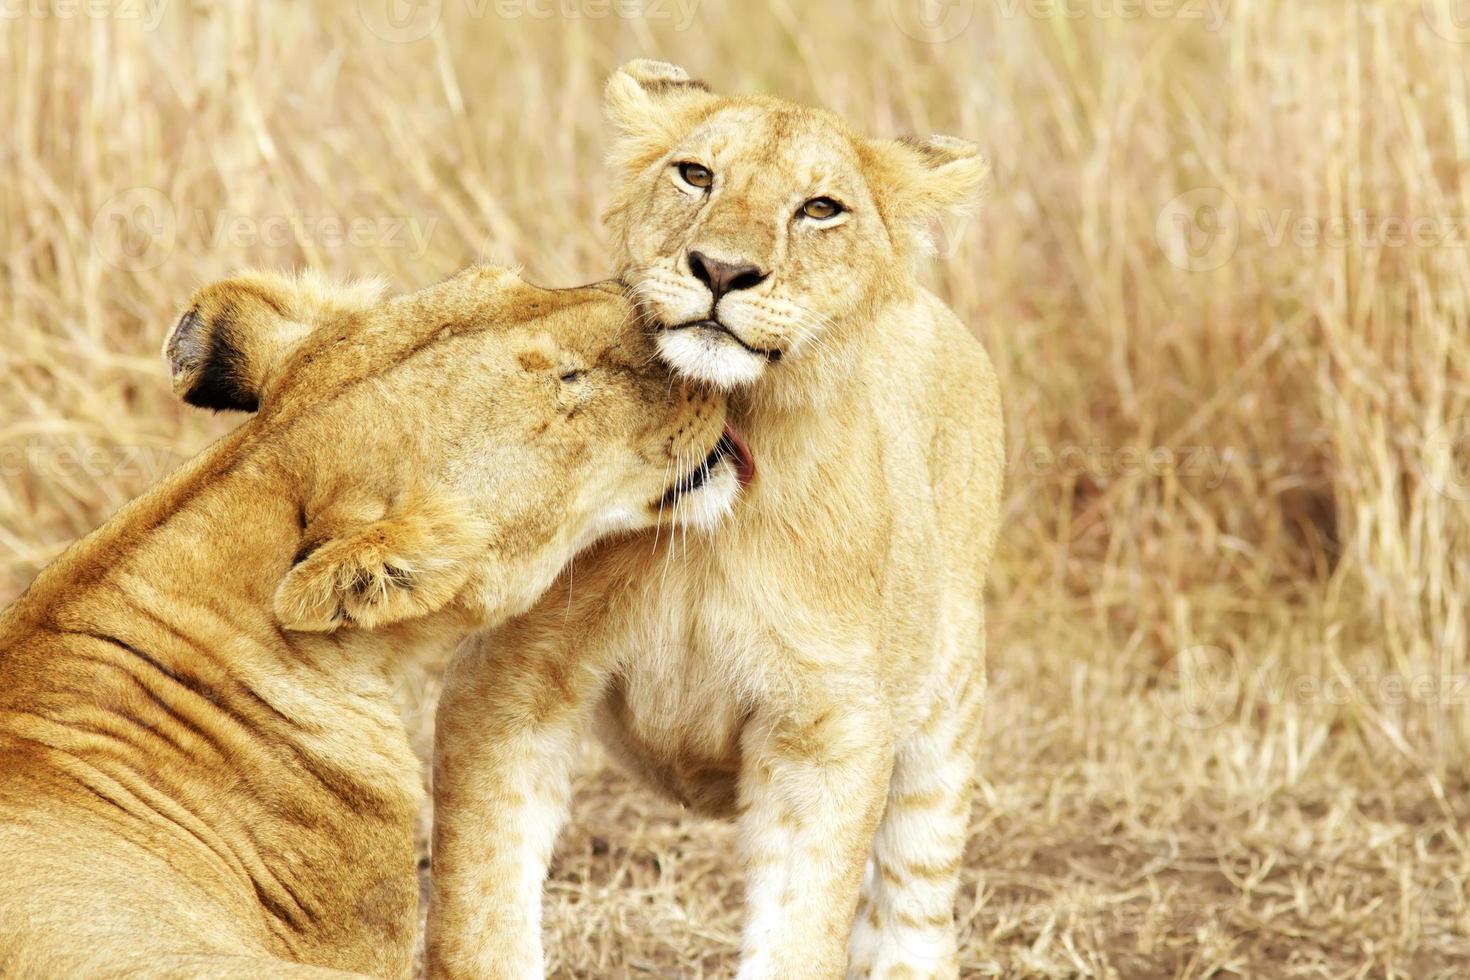 masai mara cachorro de león foto